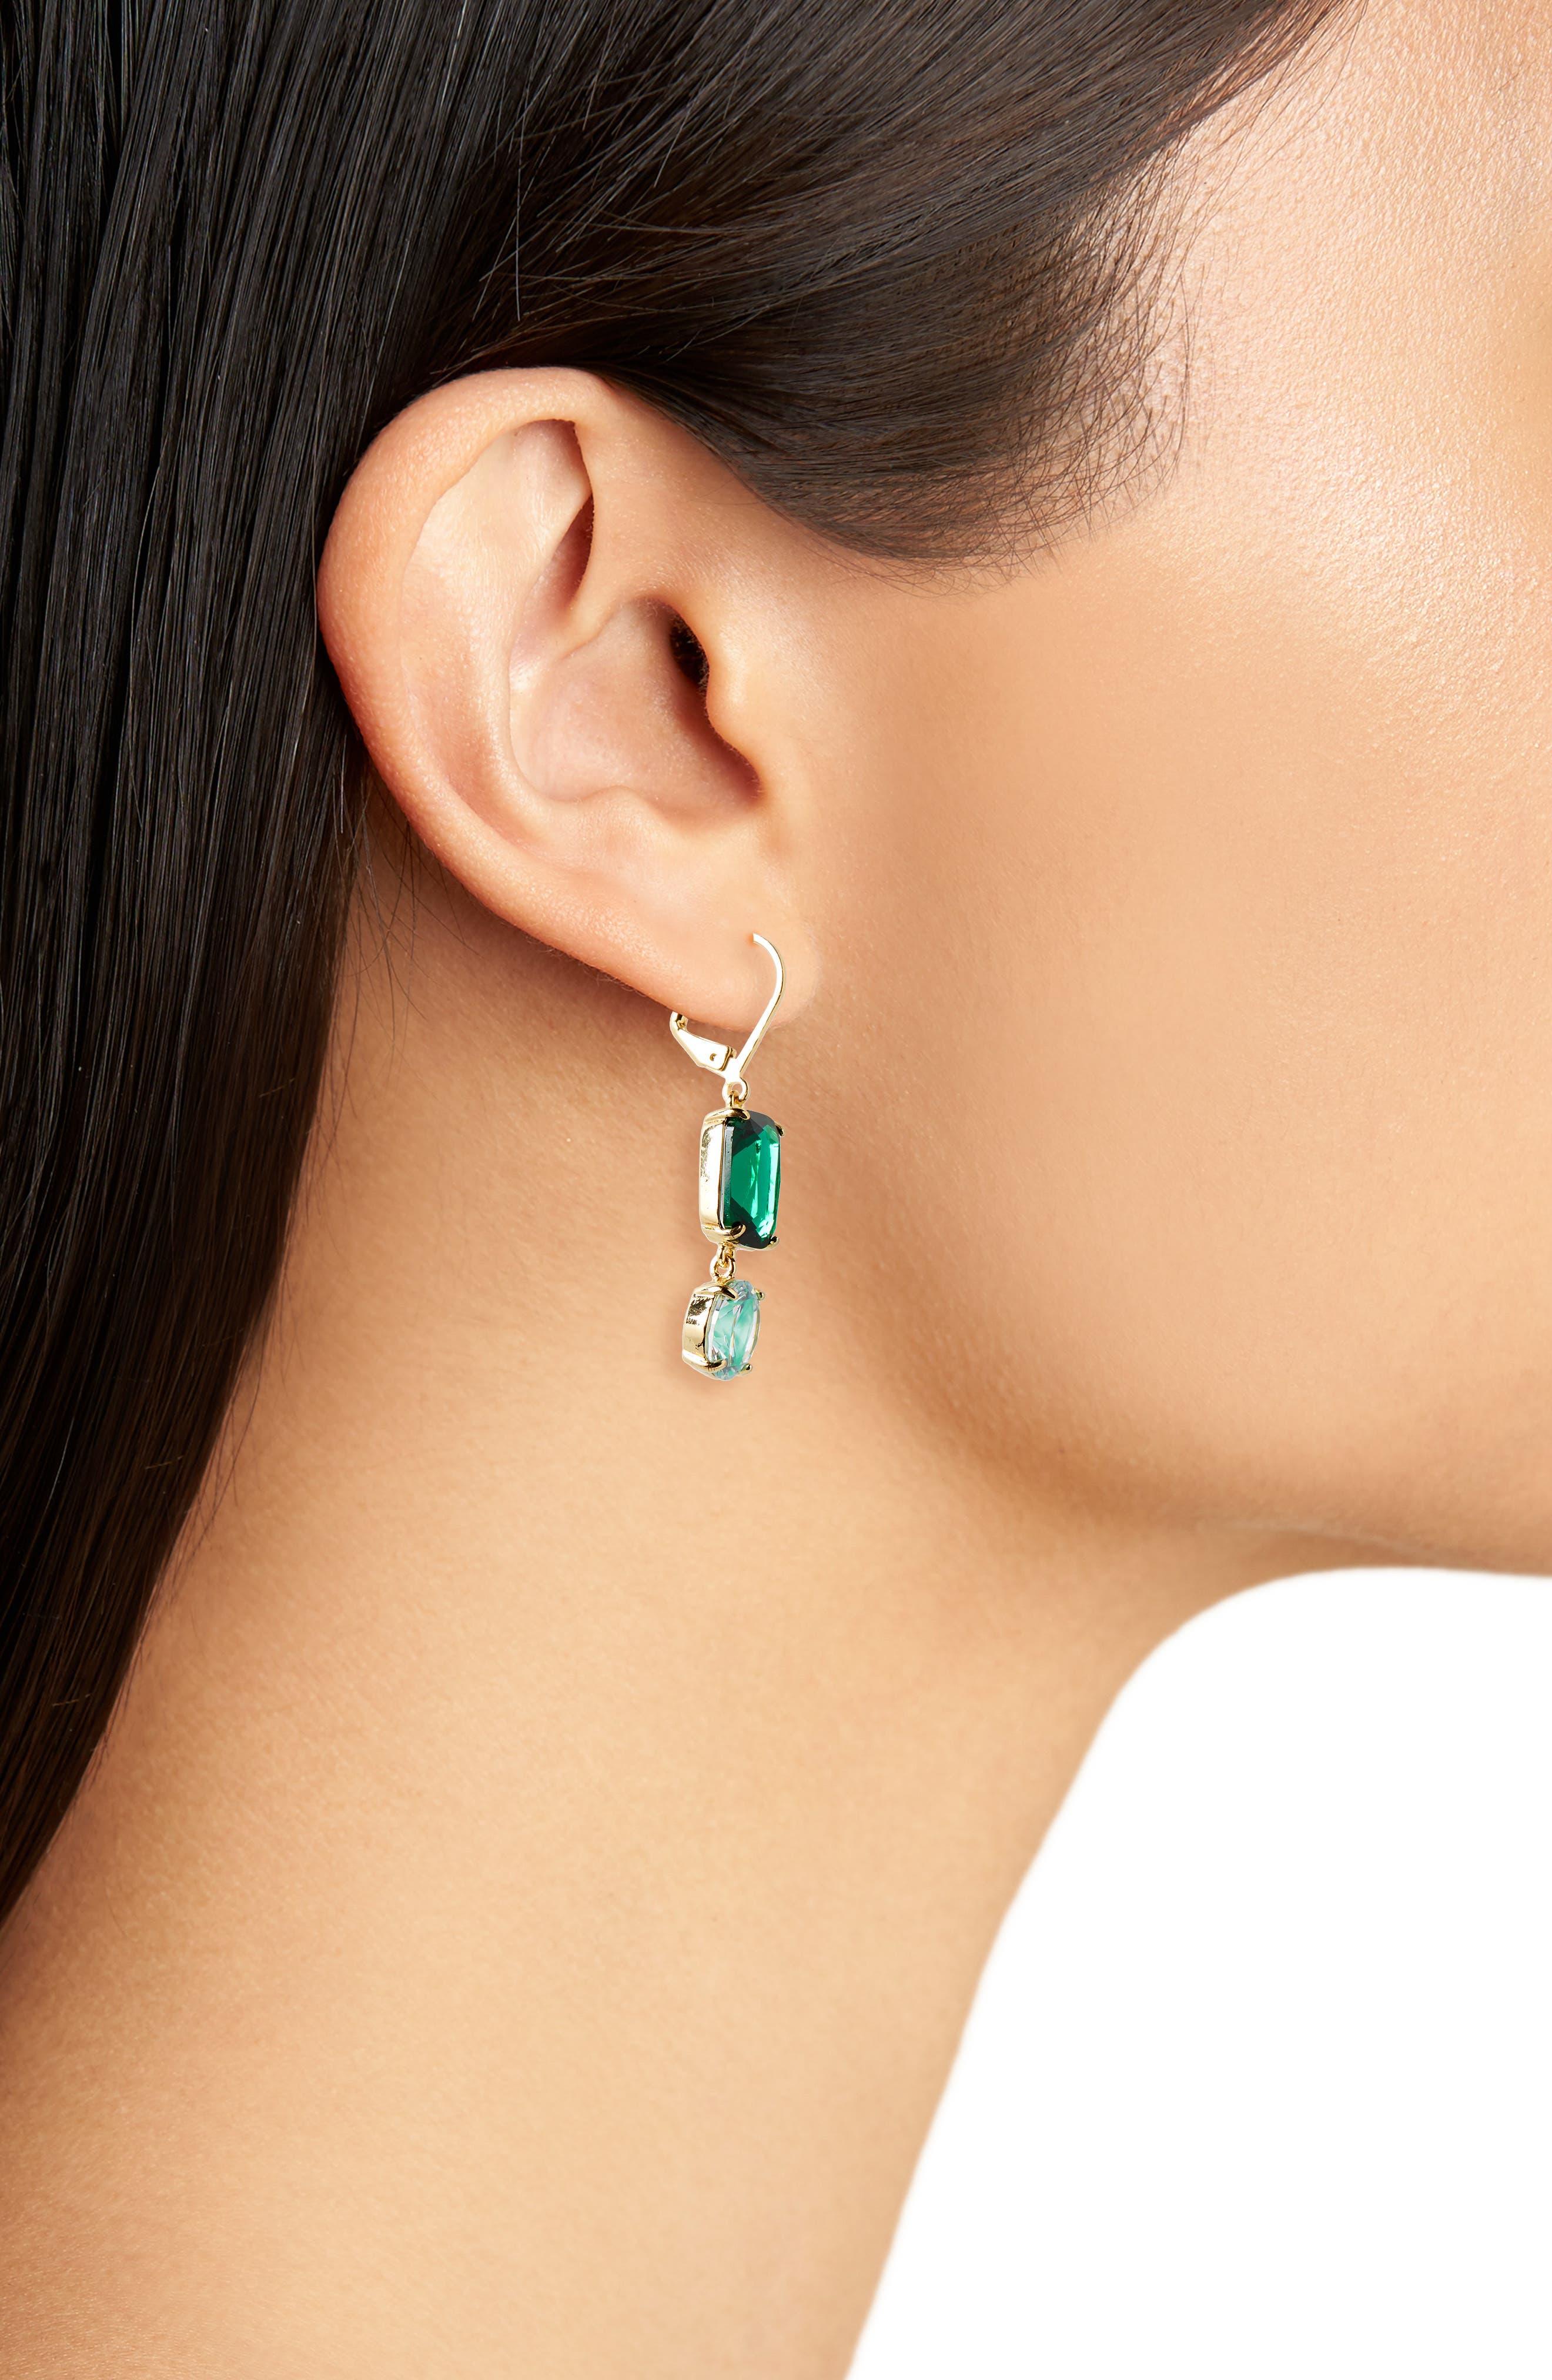 KATE SPADE NEW YORK,                             kate spade shine on mismatched drop earrings,                             Alternate thumbnail 2, color,                             300